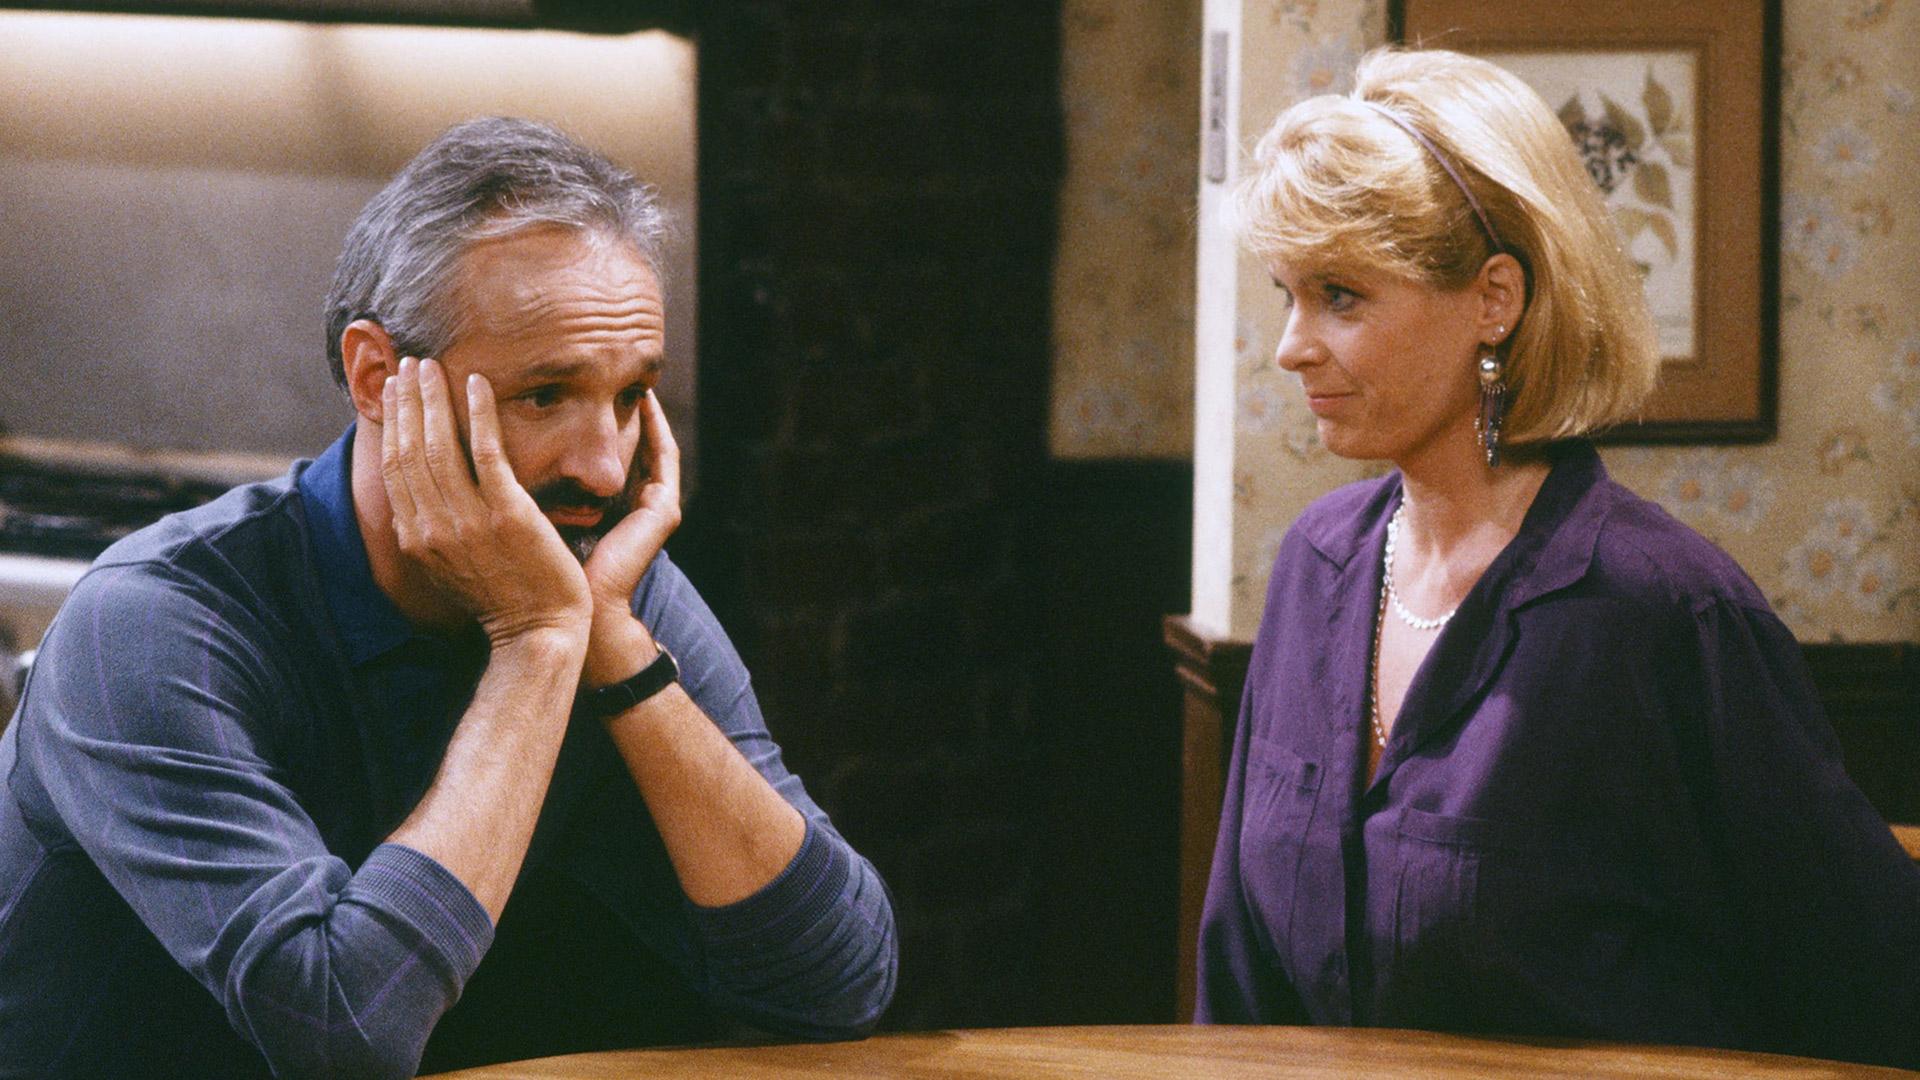 Steven and Elyse Keaton, Family Ties